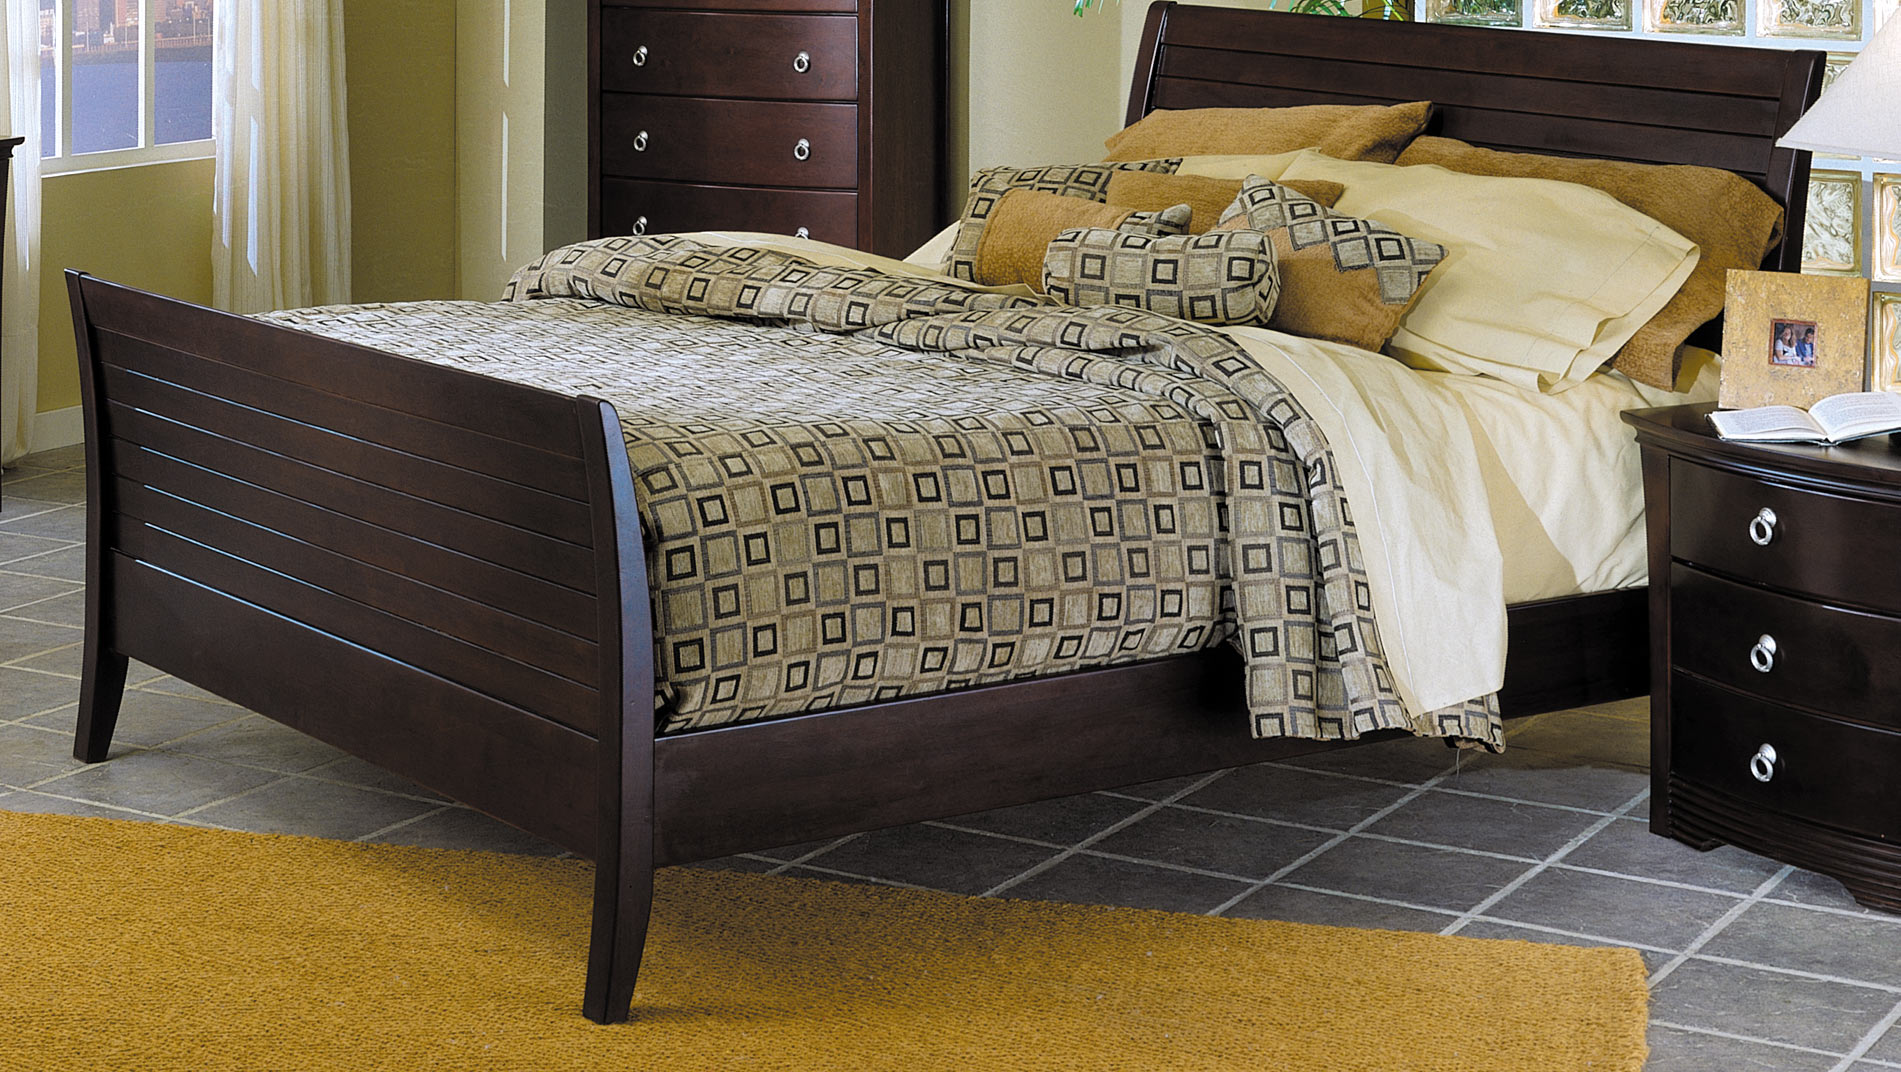 Homelegance Syracuse Sleigh Bed with Wood Rails